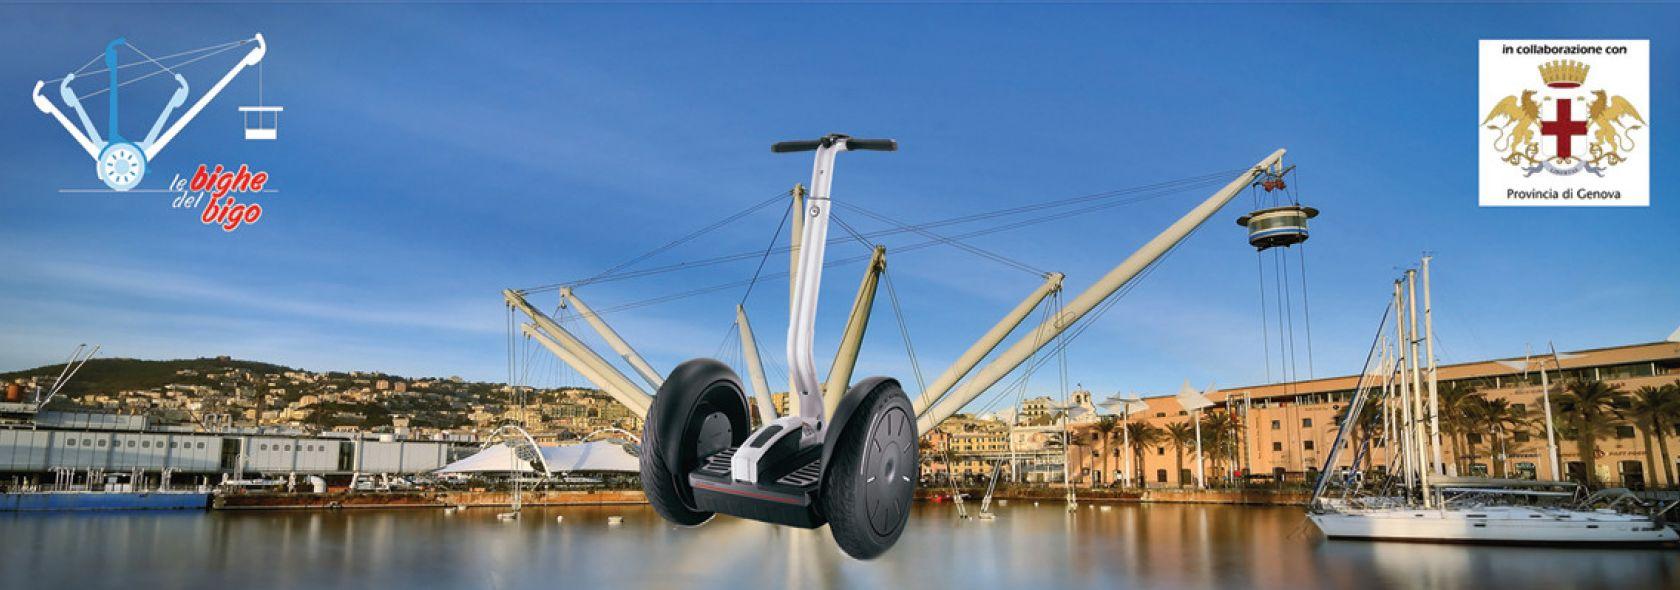 Visite guidate con il Segway - foto: @ Genova Segway Tour